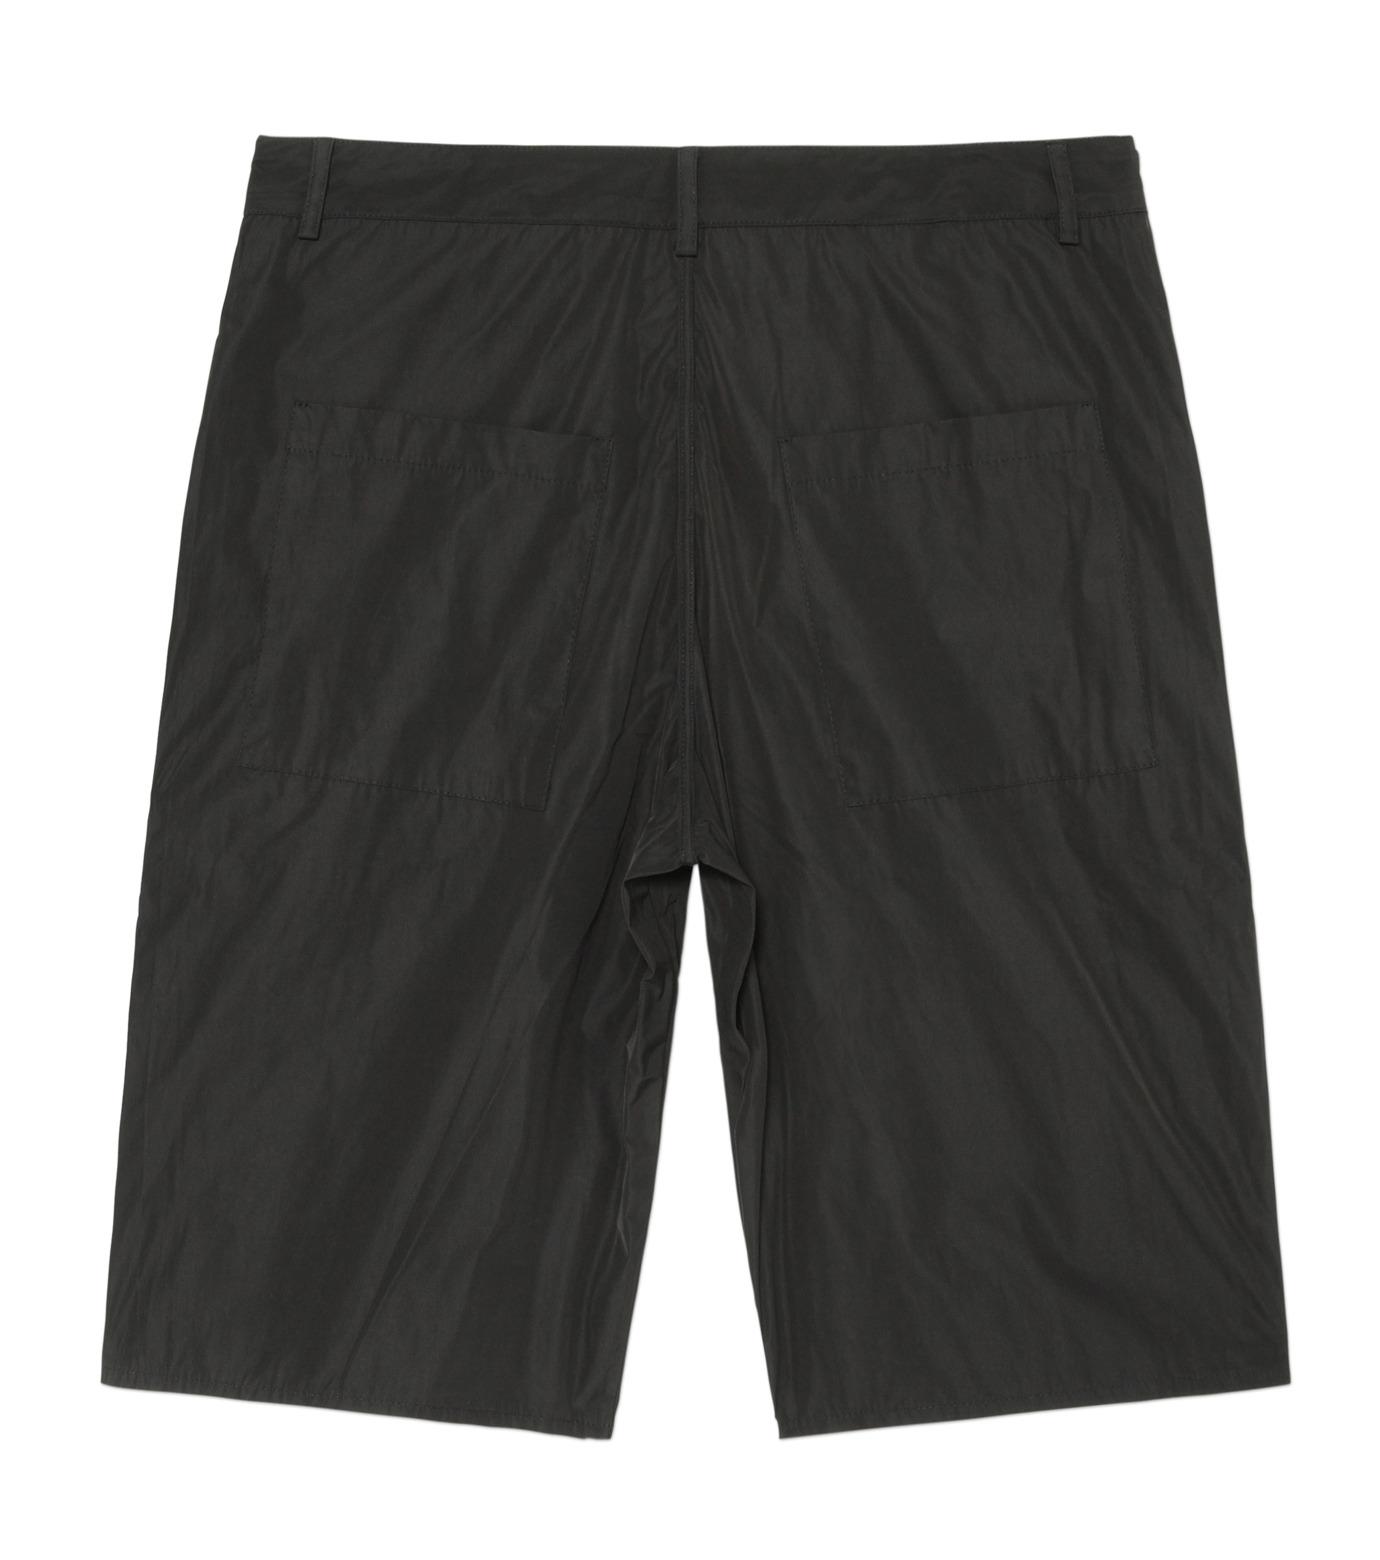 Hood By Air(フード・バイ・エアー)のTrack Snap Short w/Underwear Fly-BLACK(パンツ/pants)-S15-WS46-A-13 拡大詳細画像2